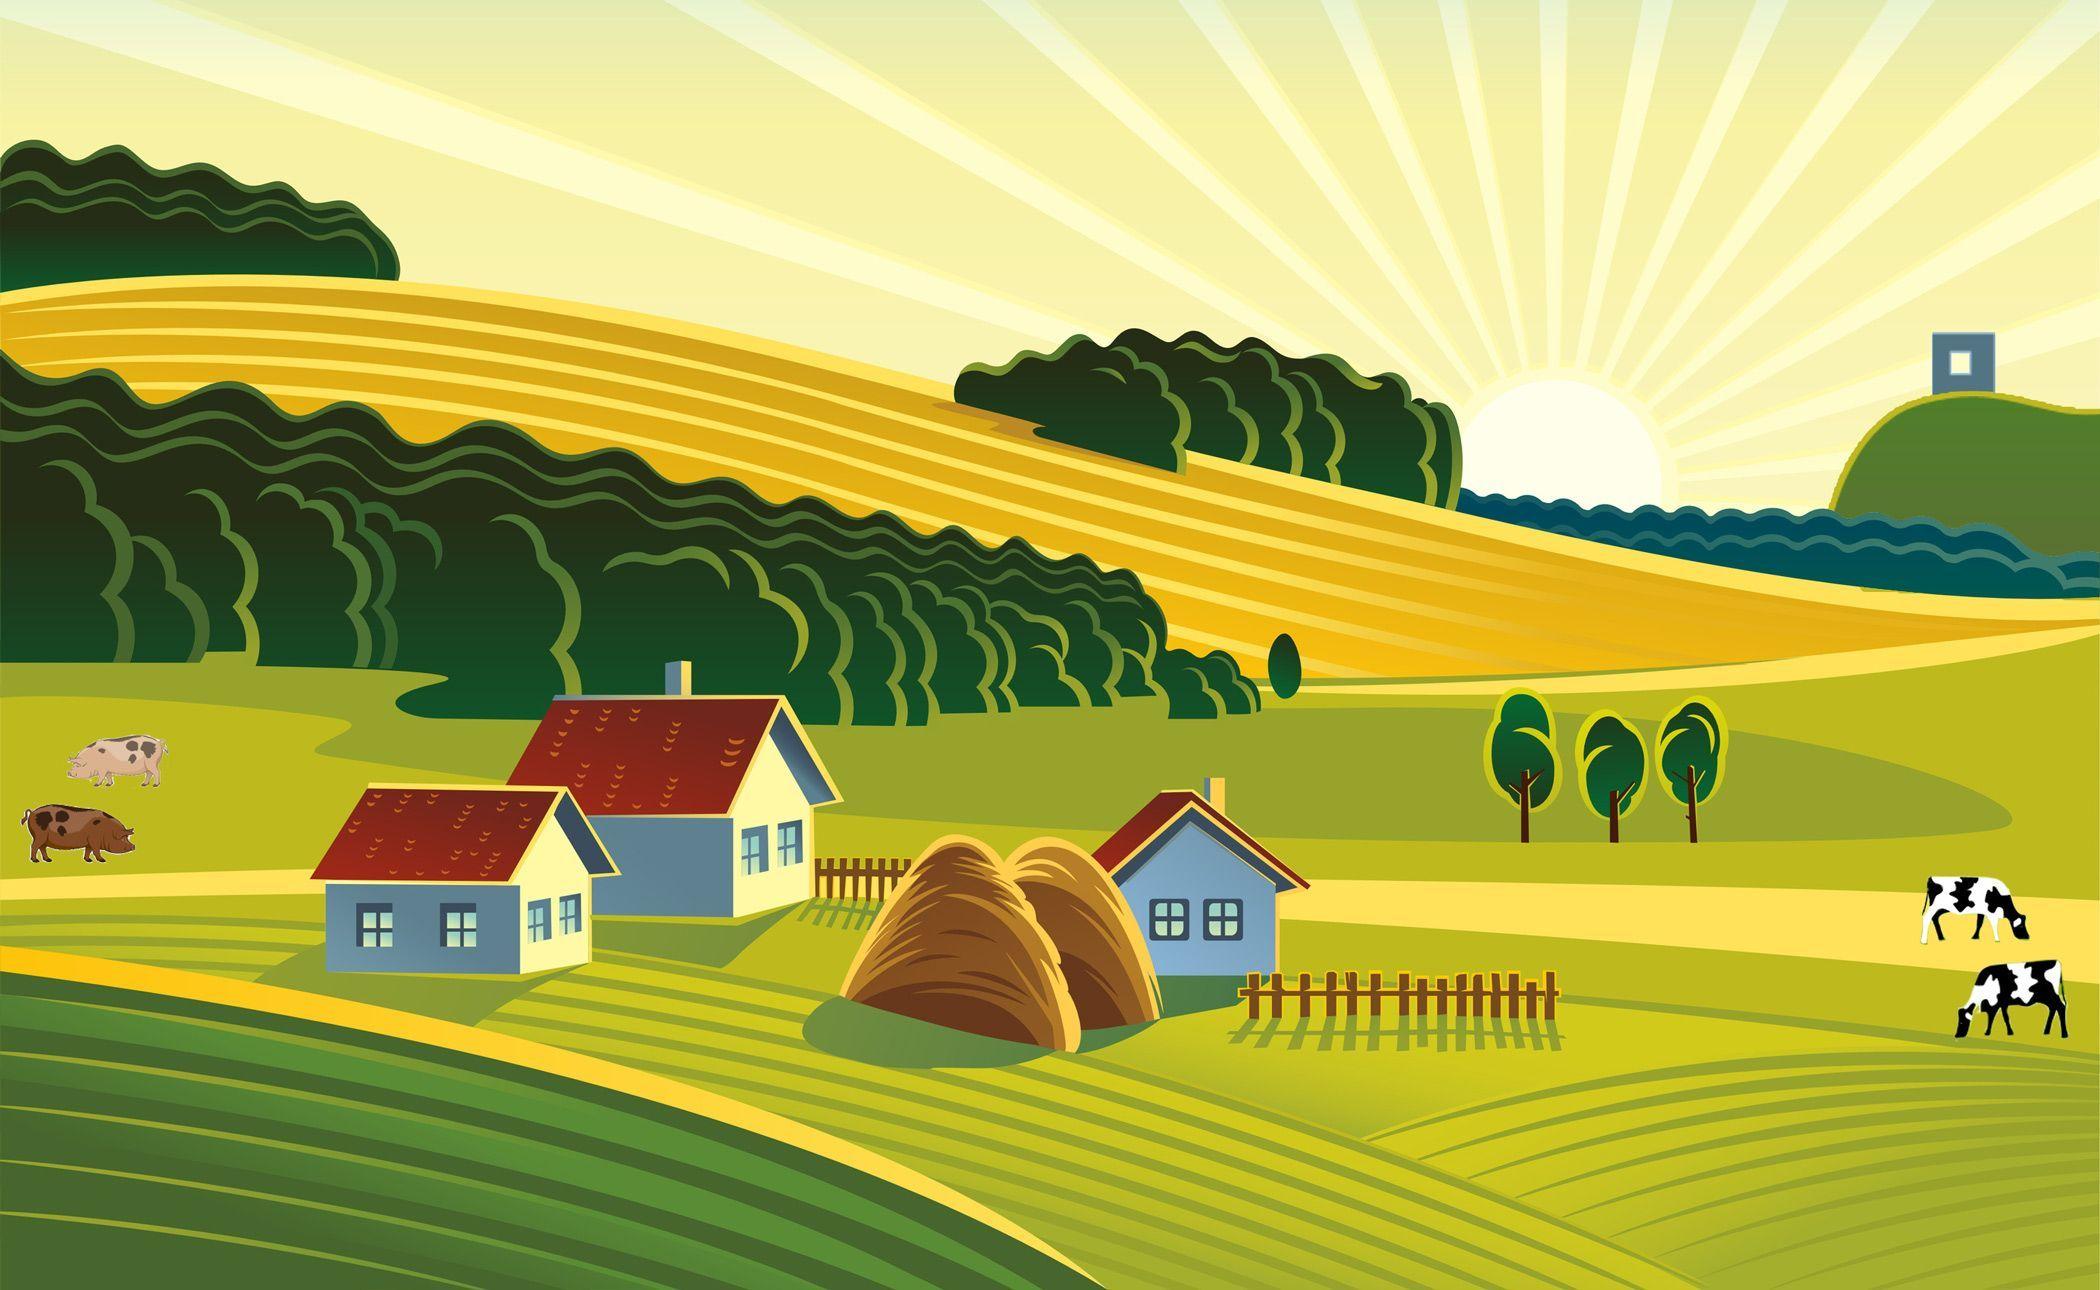 Background clipart farm 2100x1290 WallpaperPulse Cave Wallpaper Farm